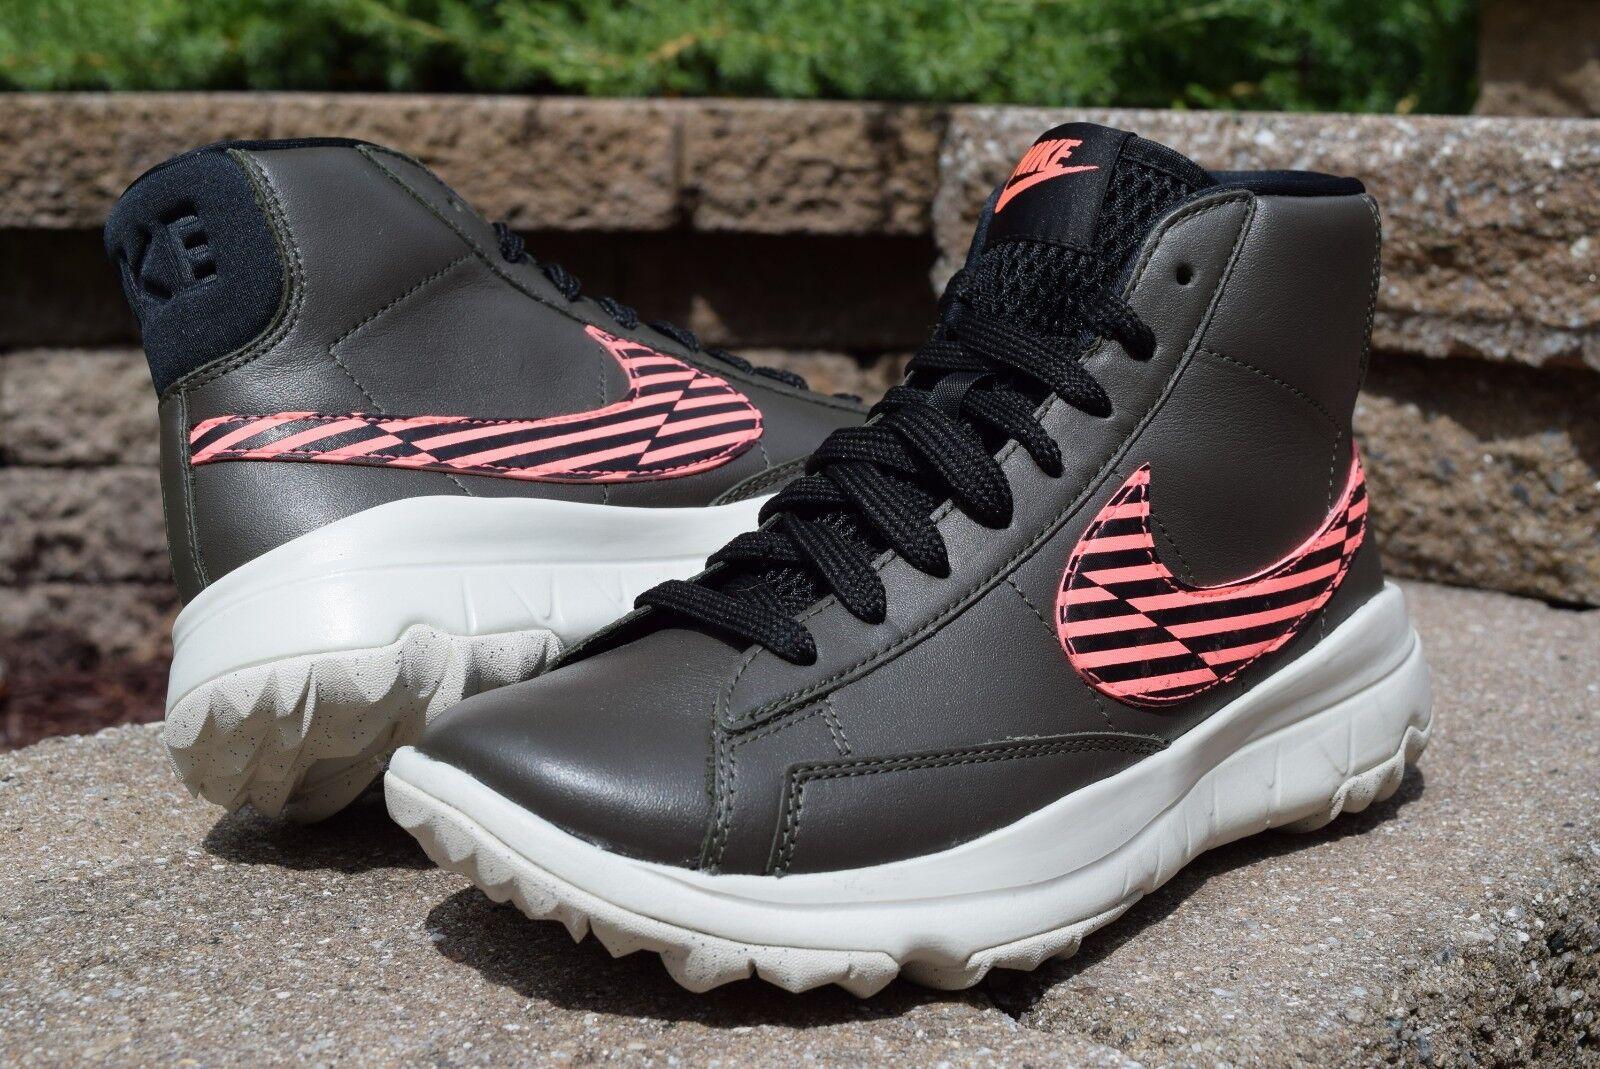 Nike Blazer Nuevo Sin Caja 10 golf mujer Zapatos de golf 10 para mujer 10 328a12